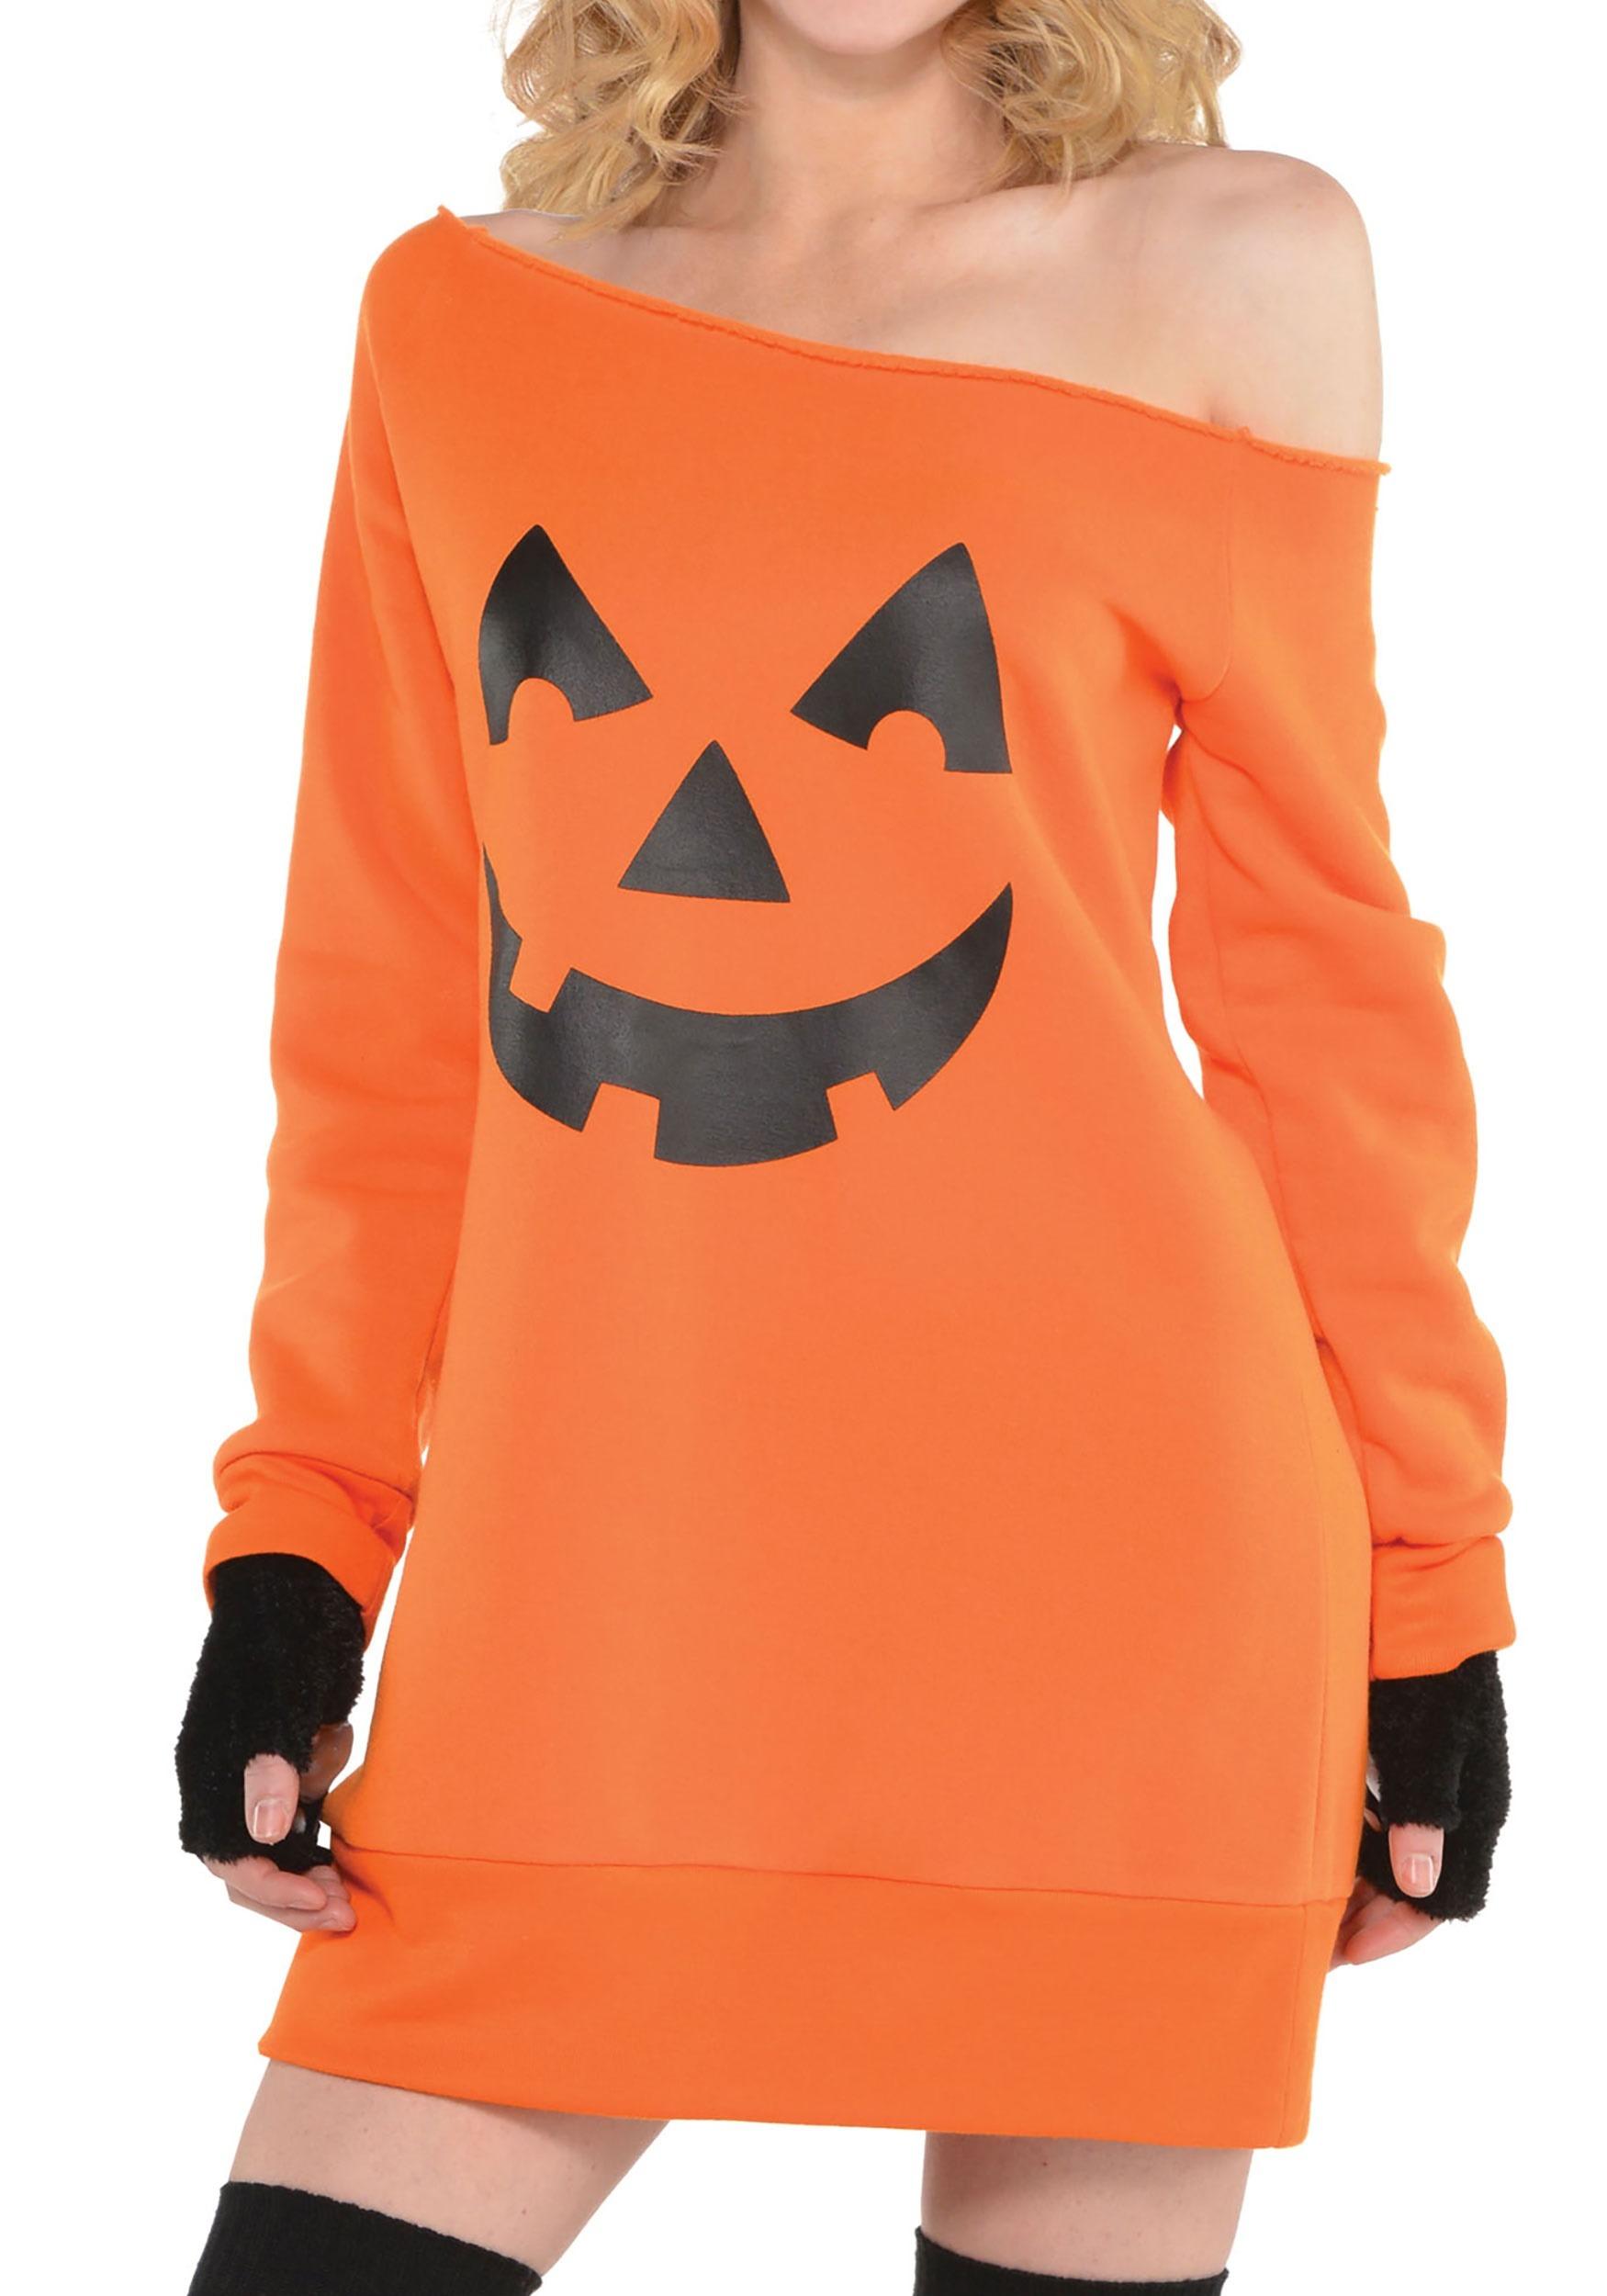 Pumpkin_Off_the_Shoulder_Tunic_for_Women